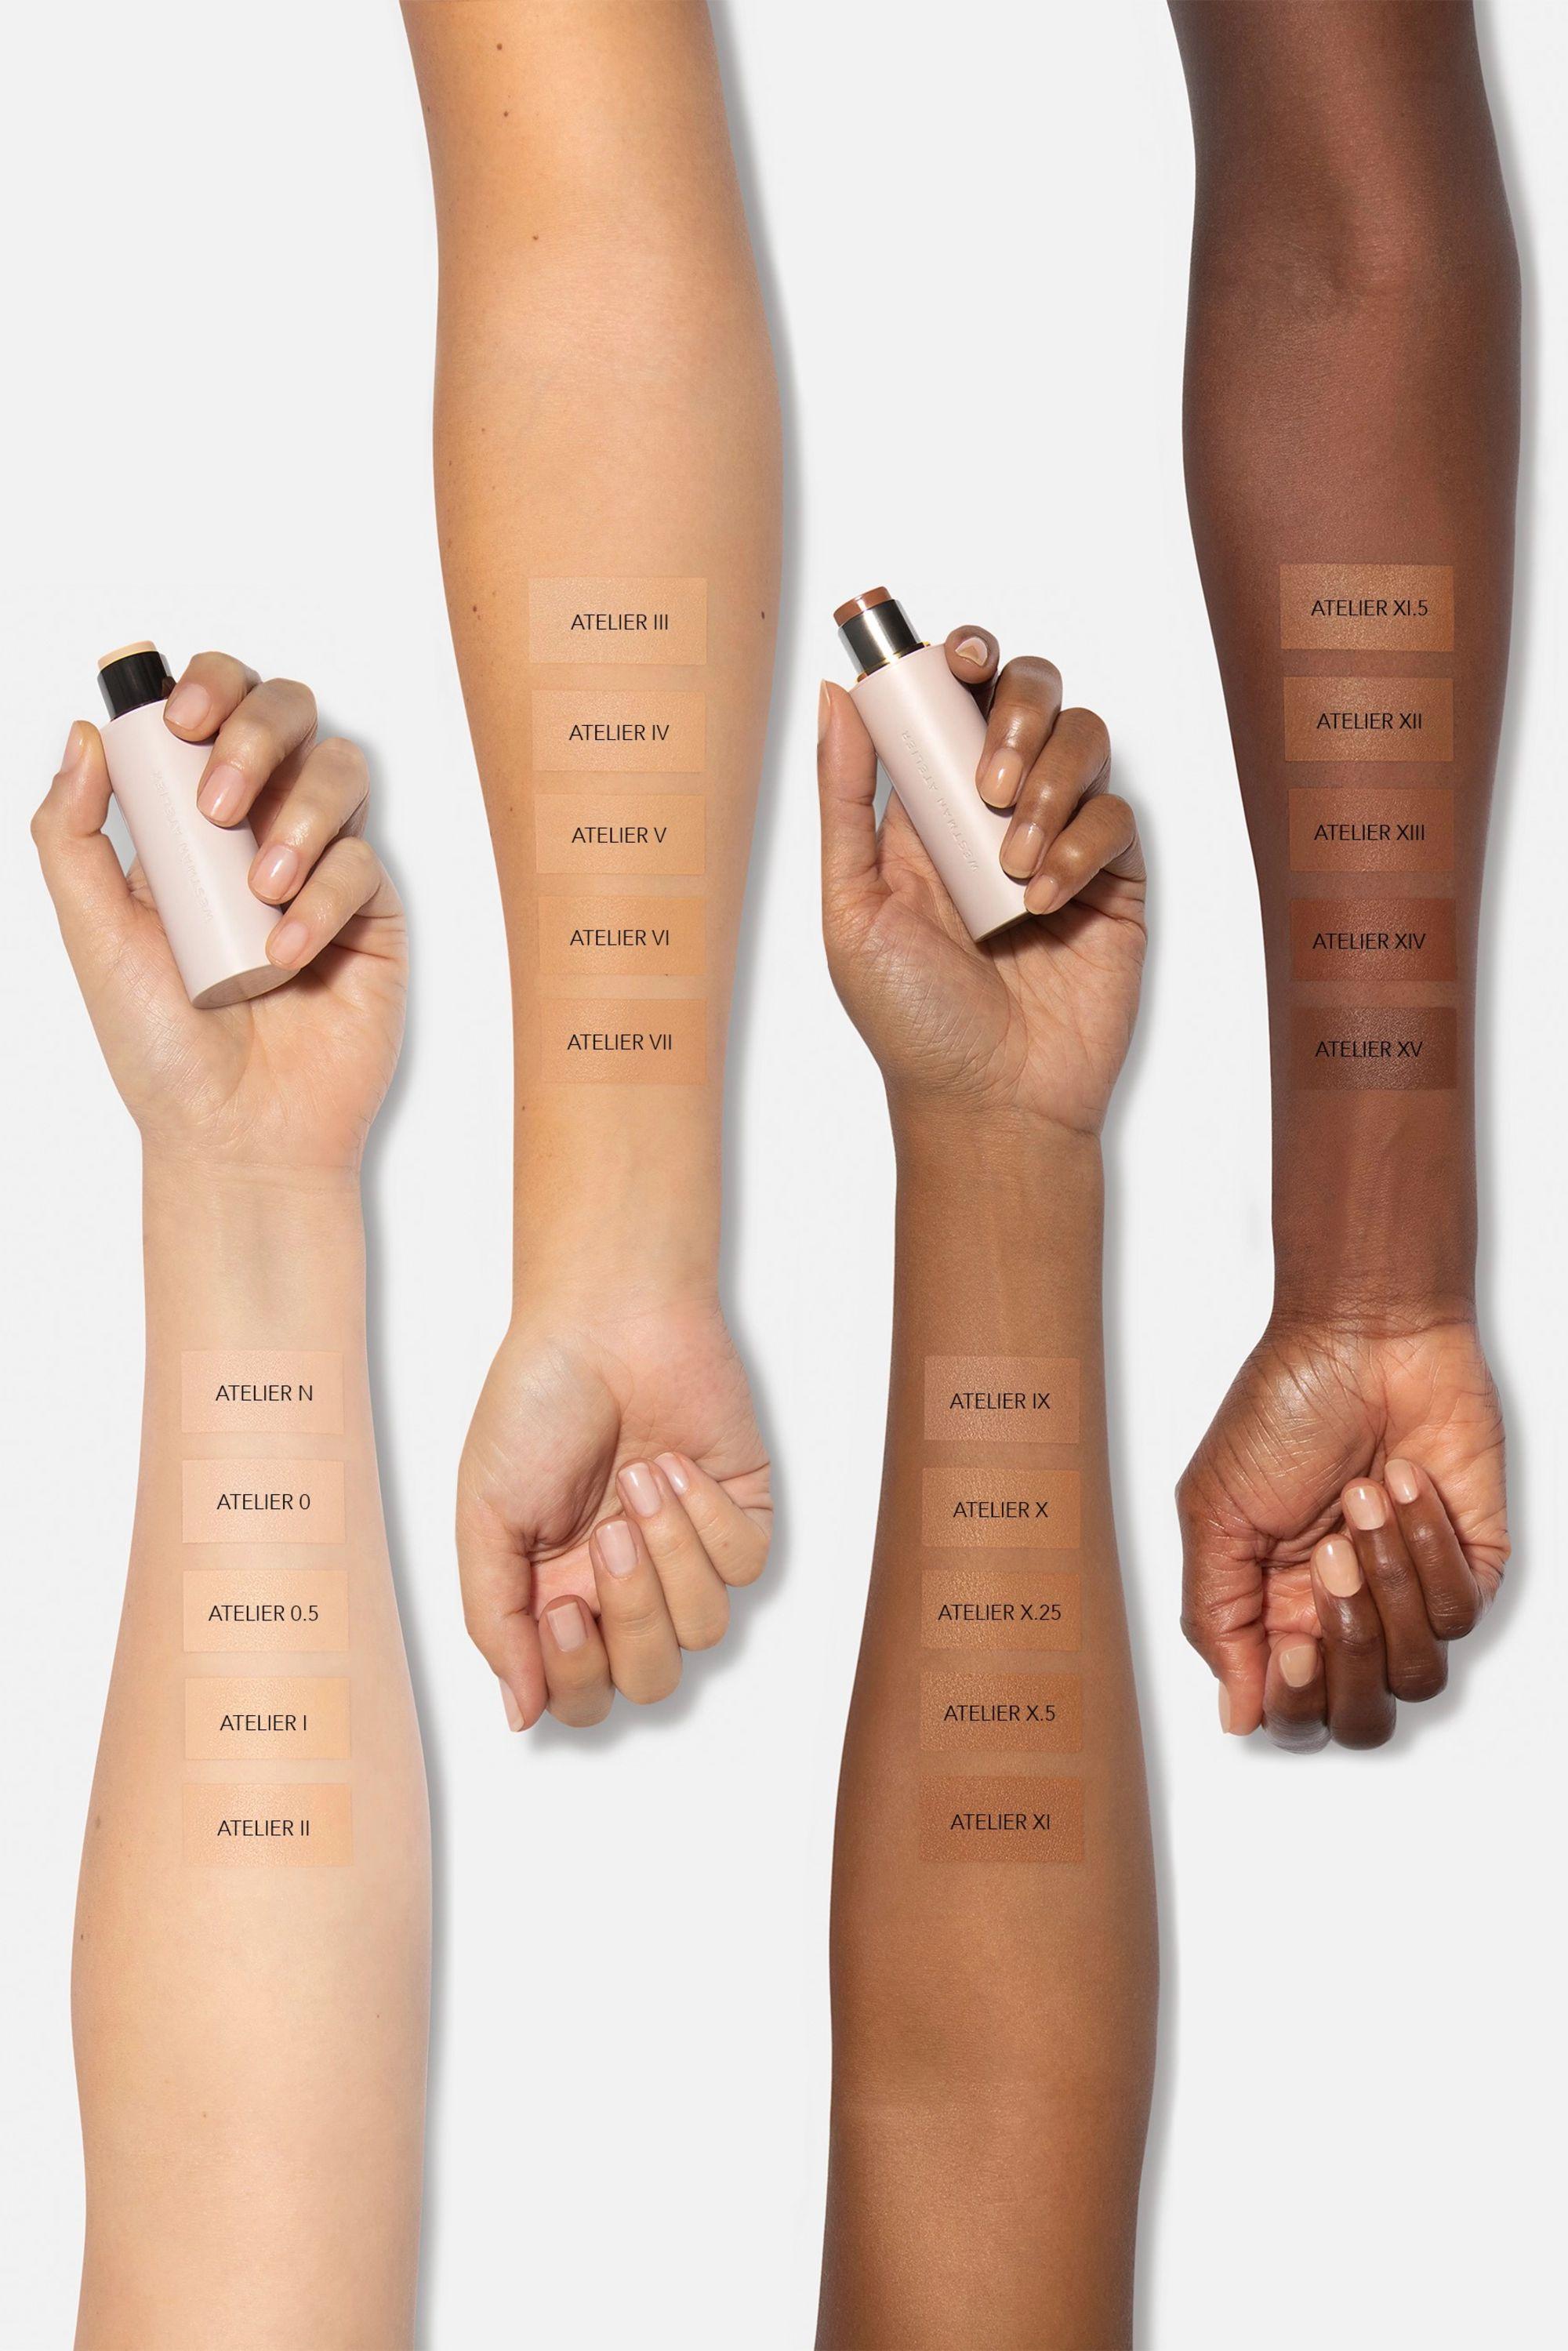 Westman Atelier Vital Skin Foundation Stick - Atelier XII